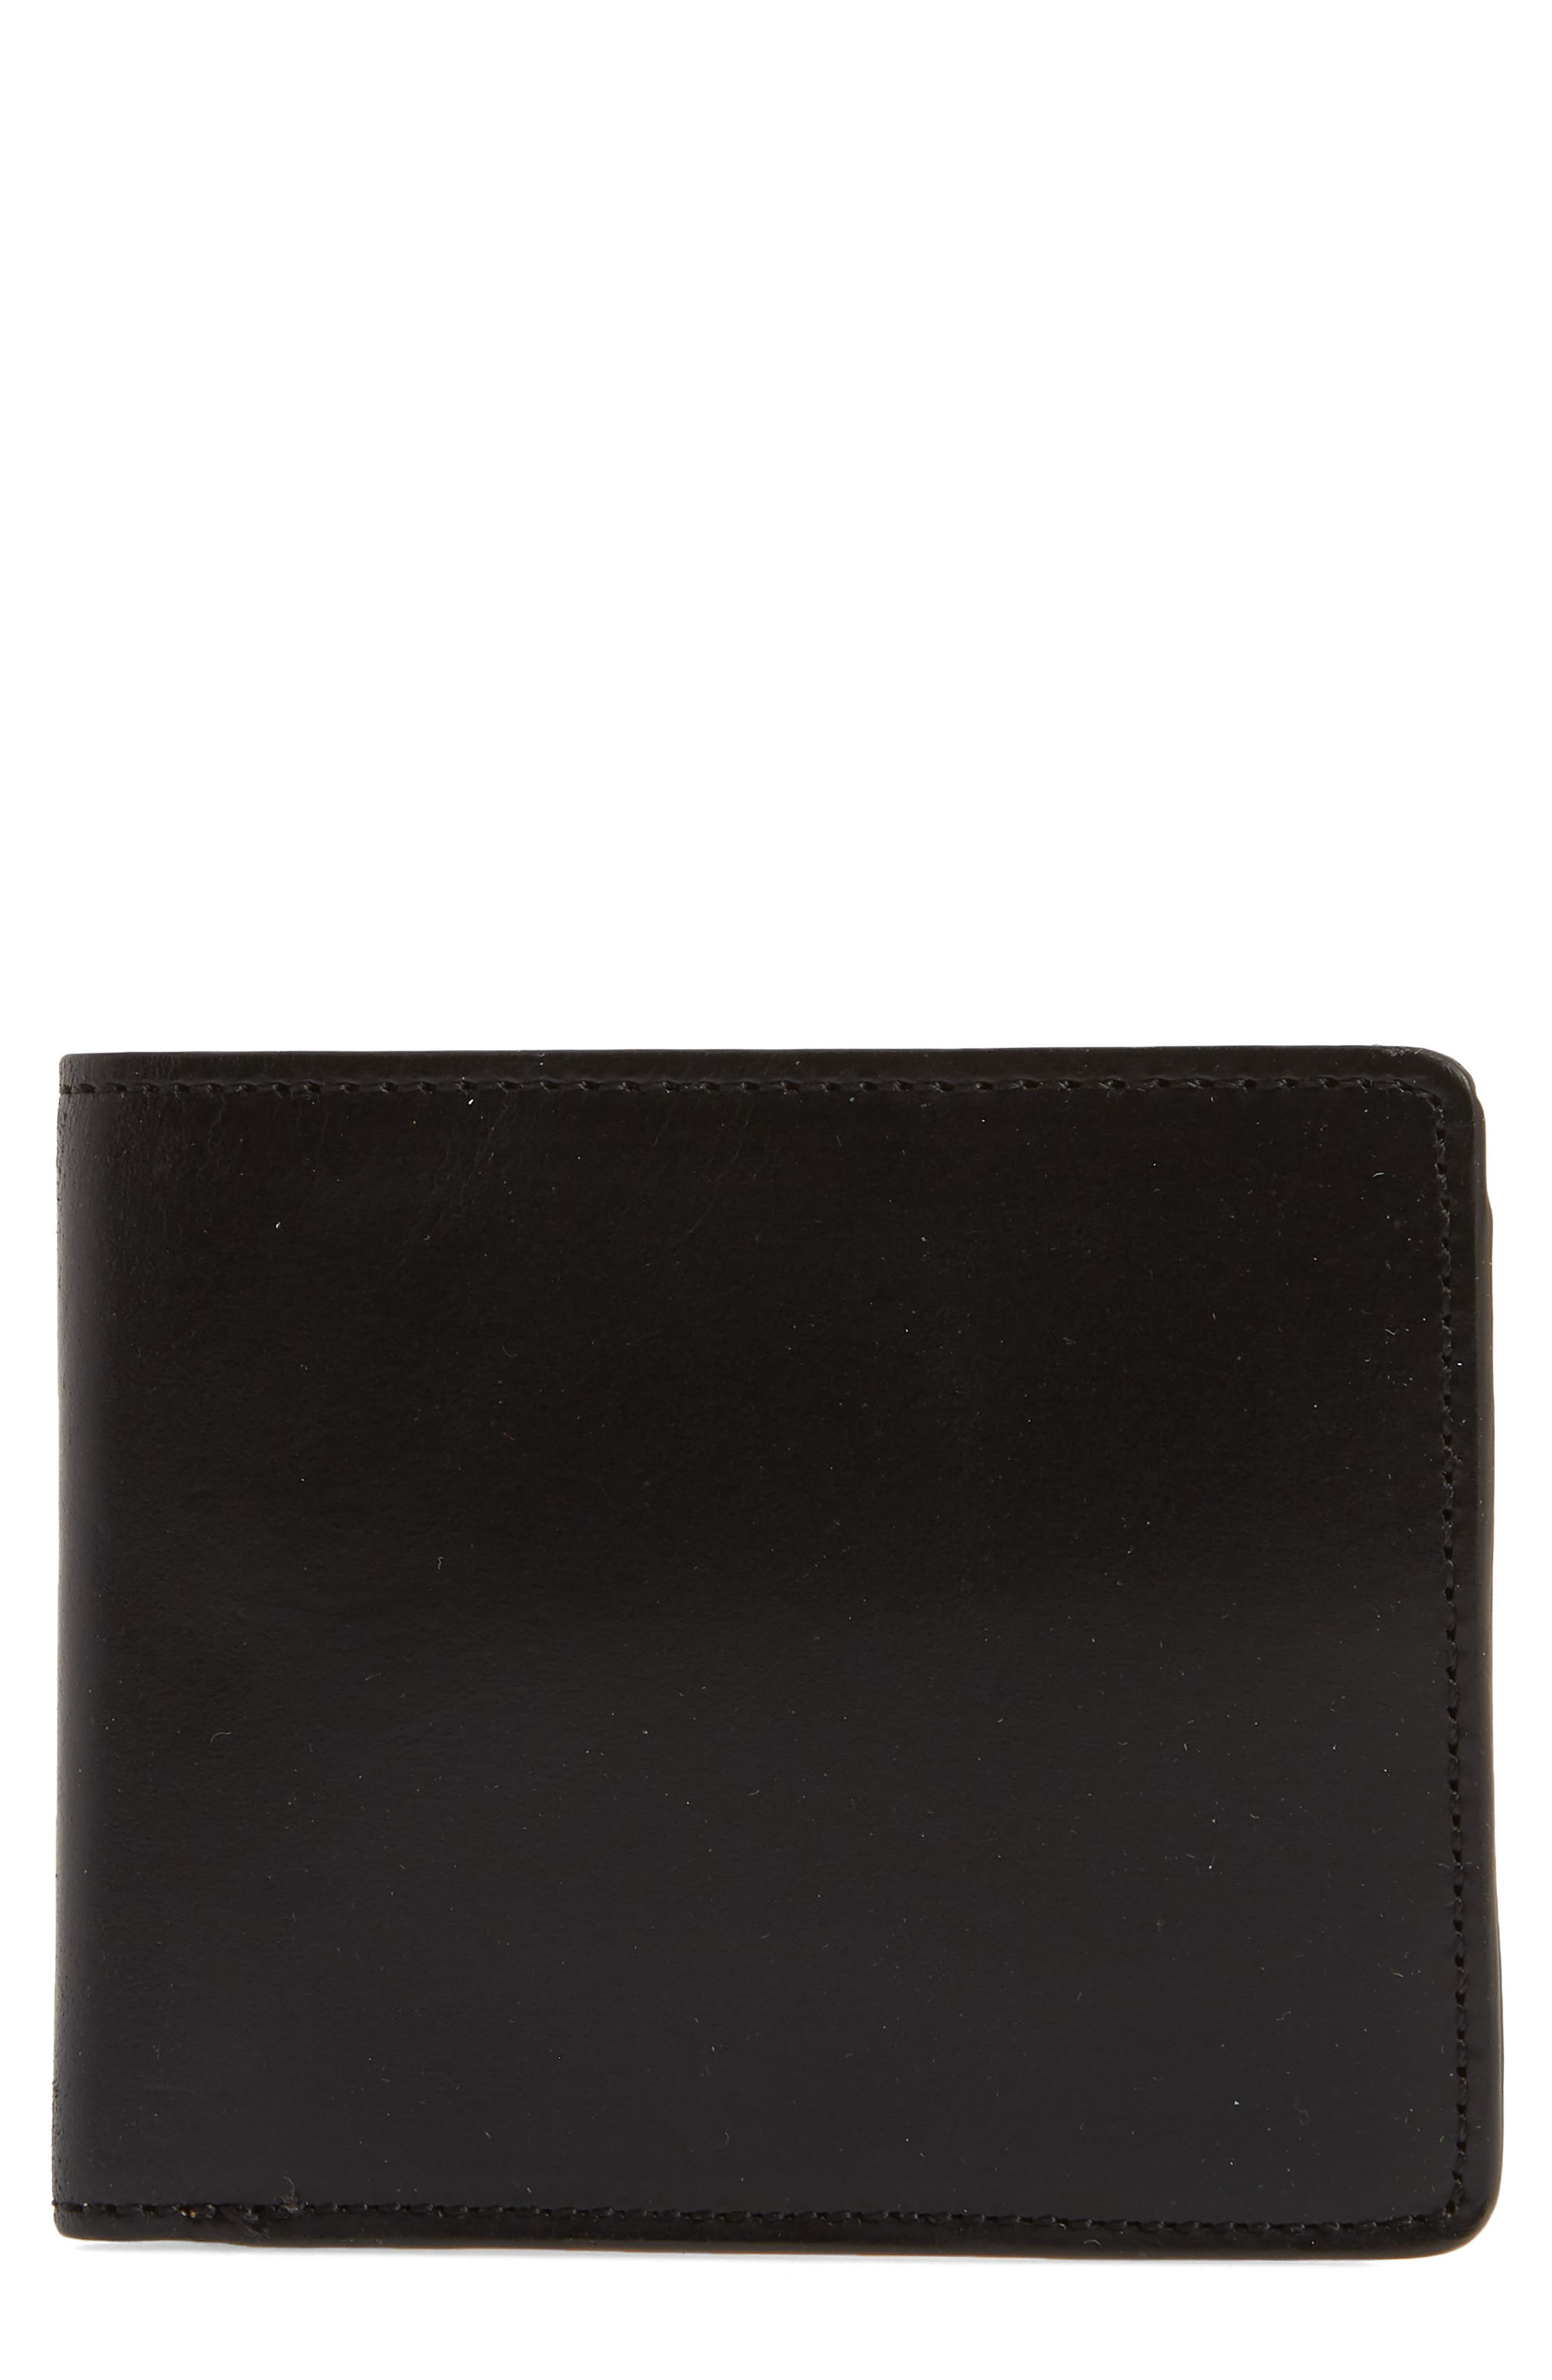 Darien Leather Wallet,                             Main thumbnail 1, color,                             Black